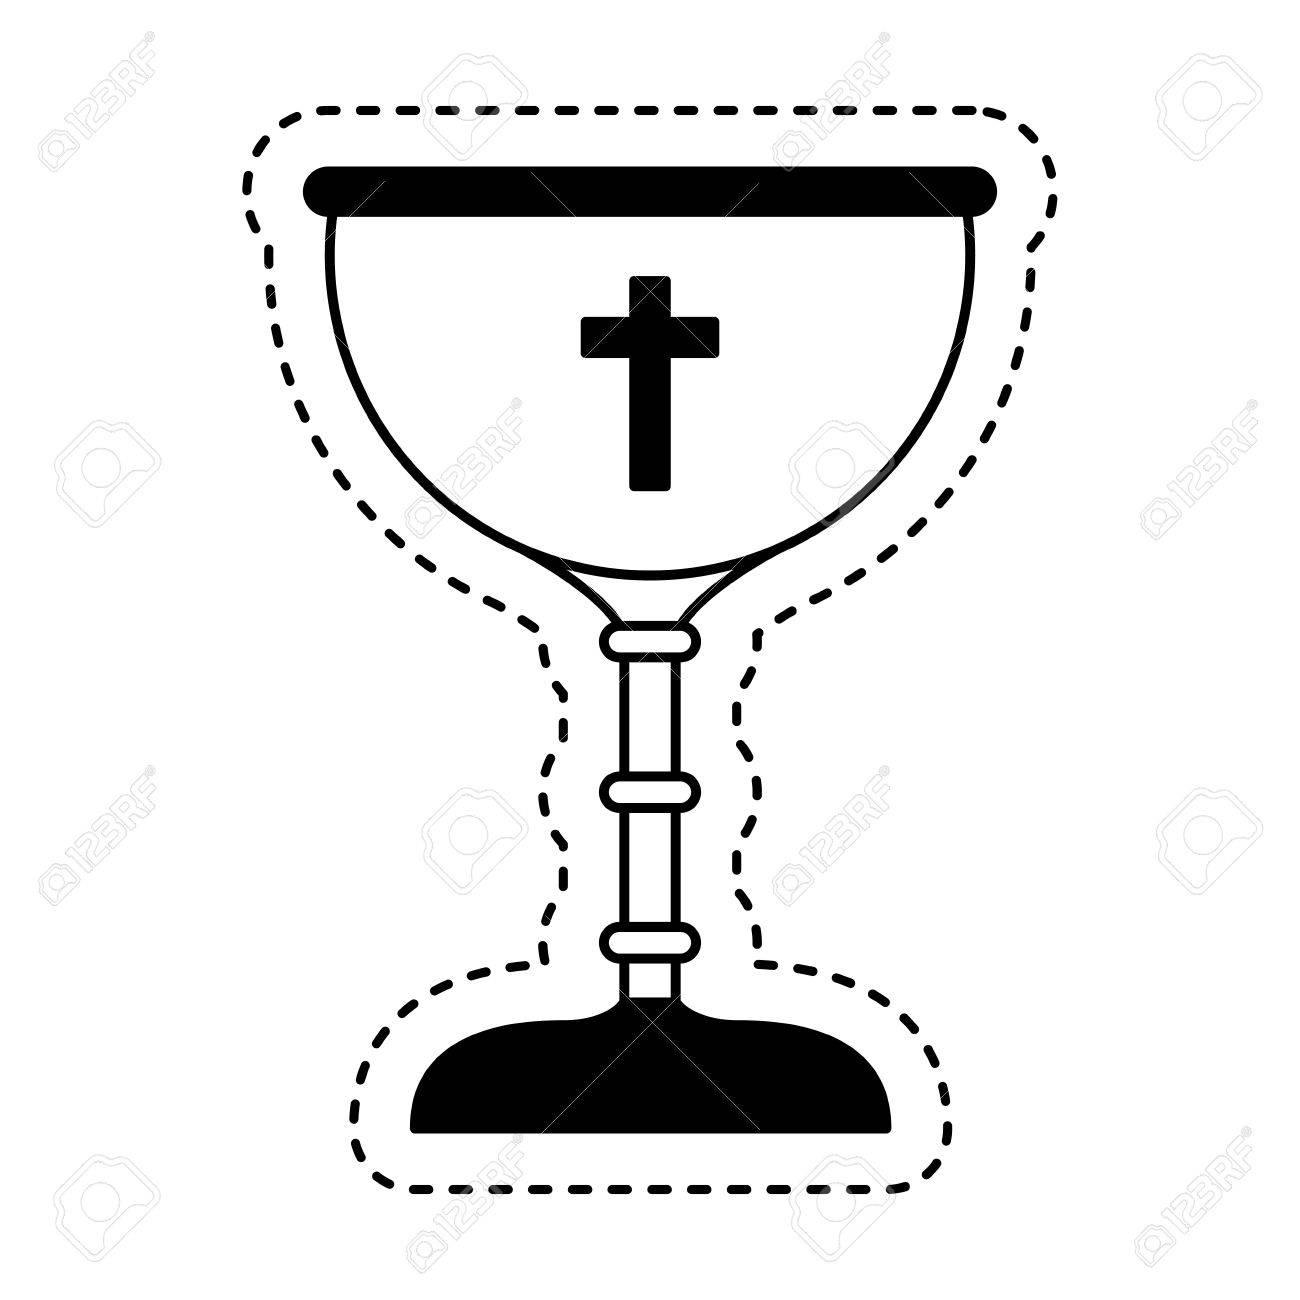 chalice first communion icon vector illustration design - 69886850